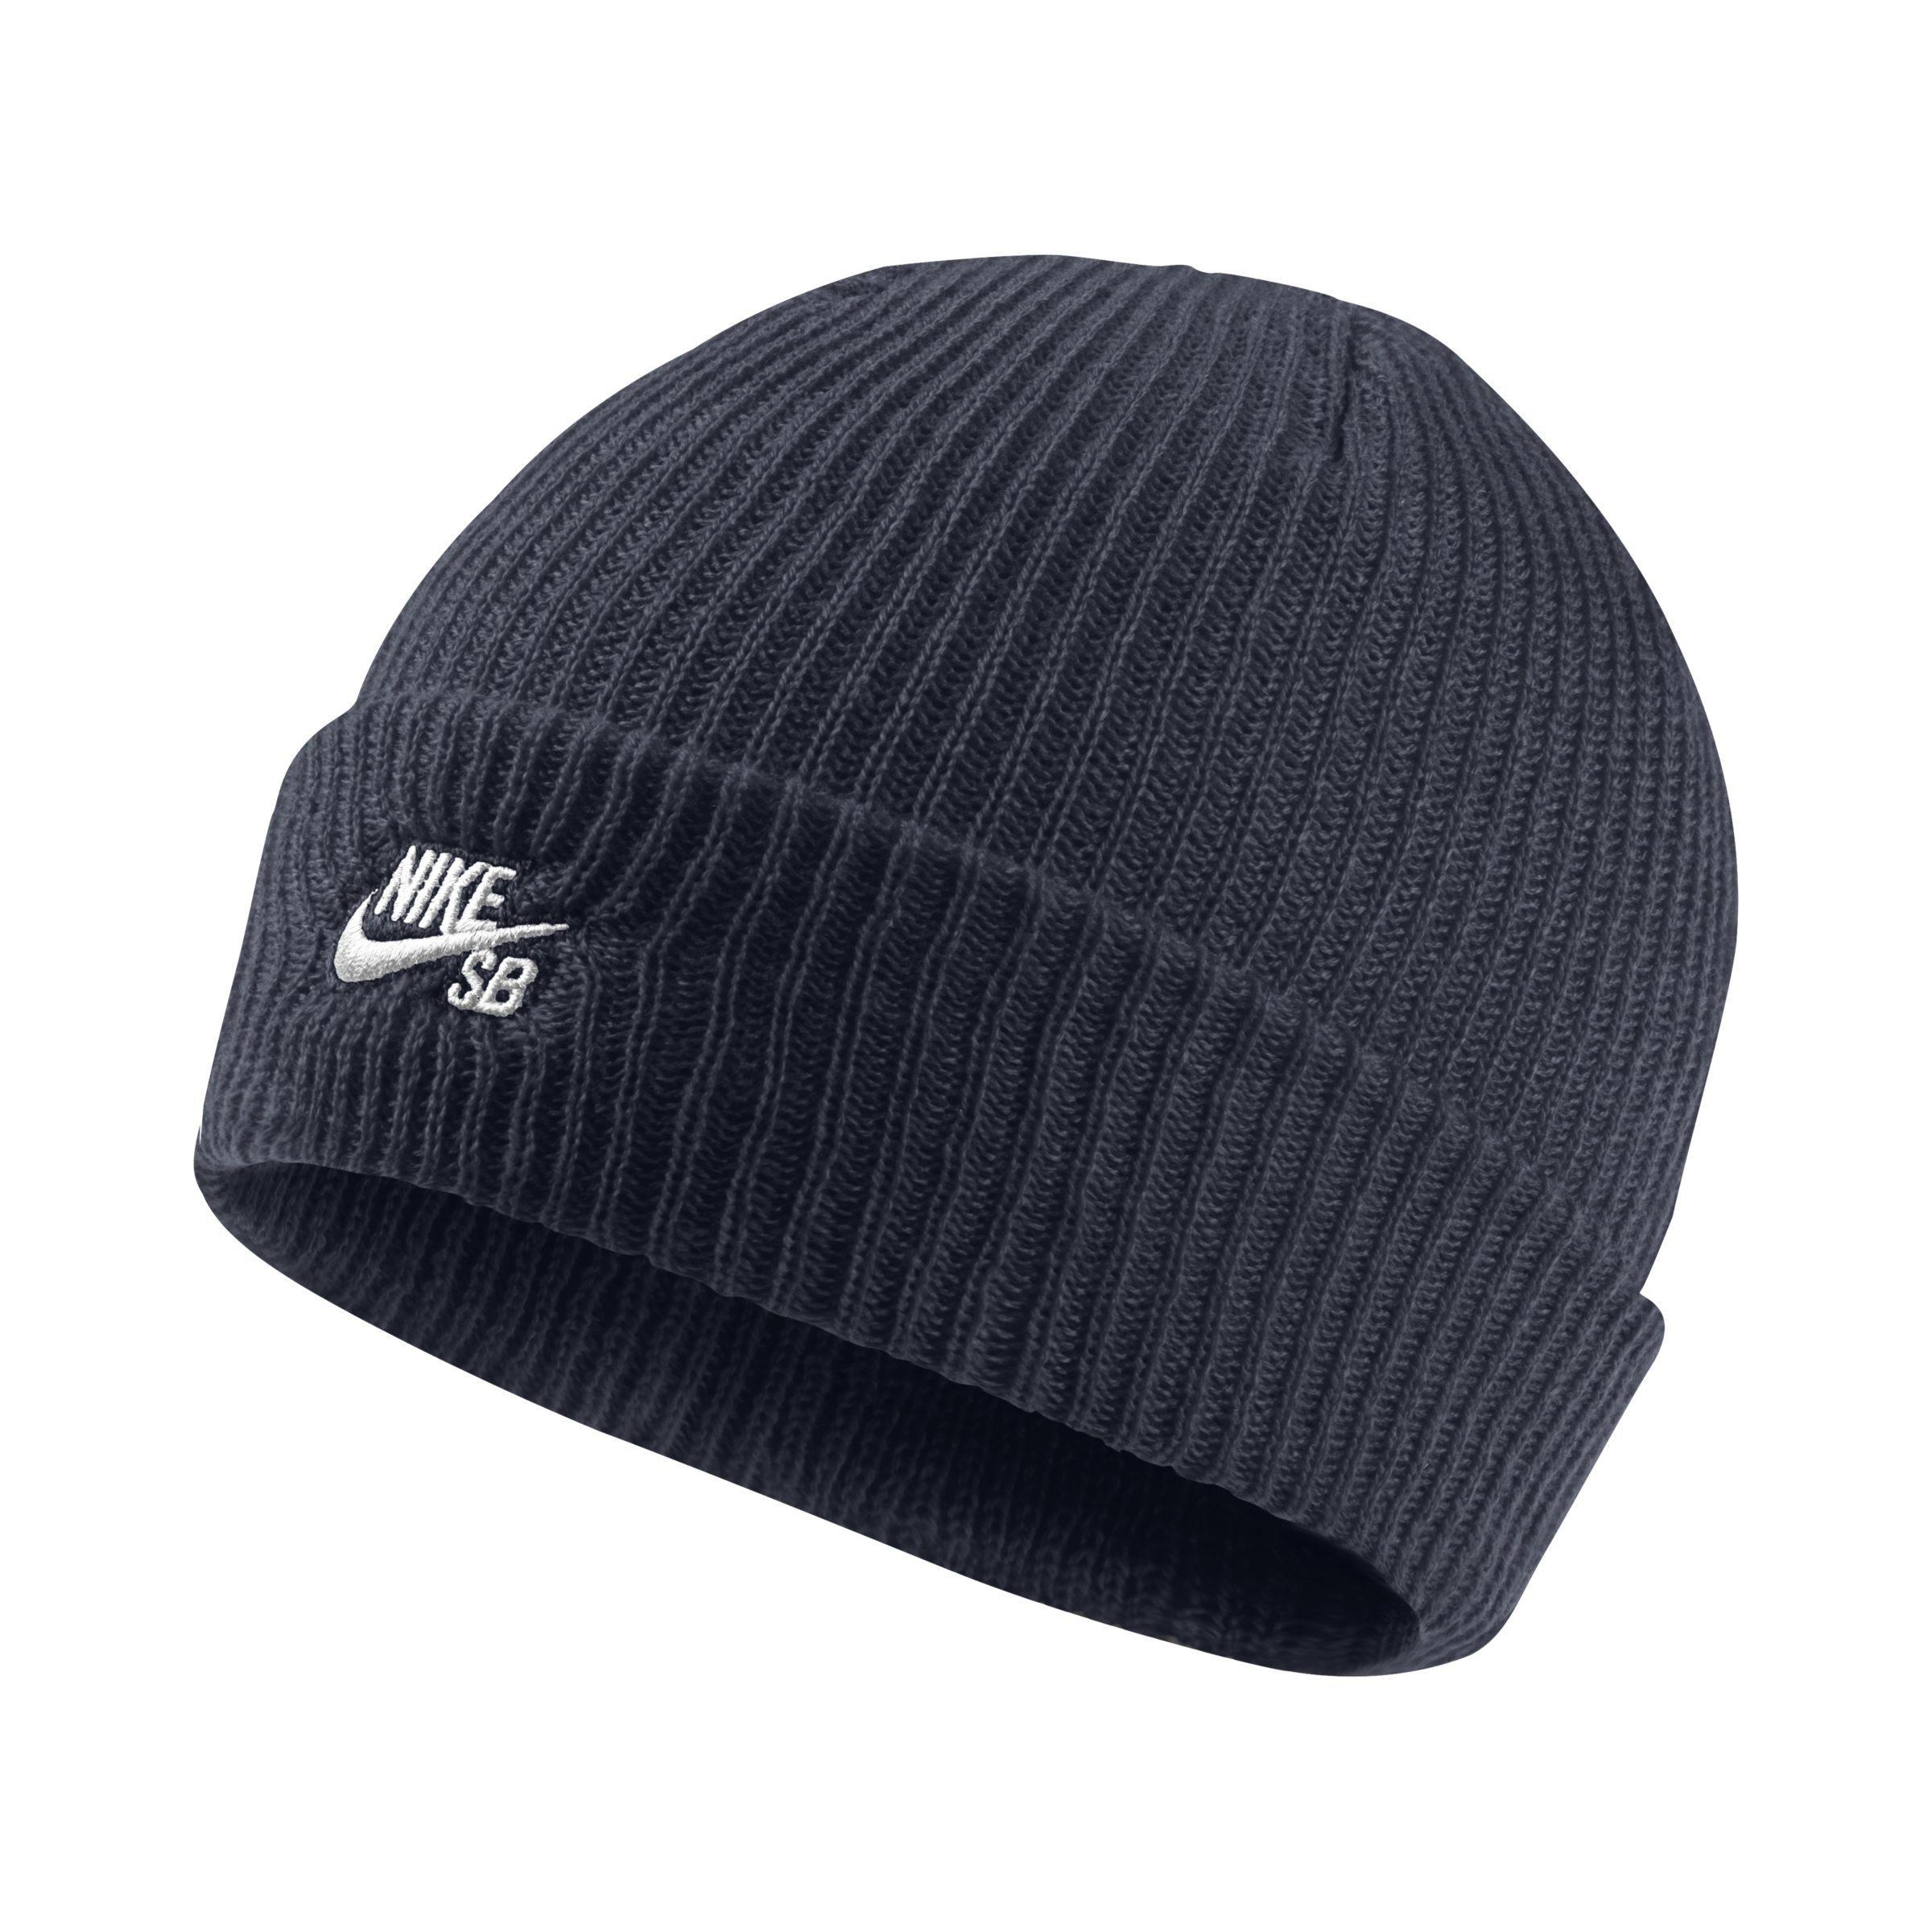 b7a0215b9c9872 ... shop nike. womens blue sb fisherman knit hat 139f0 ab455